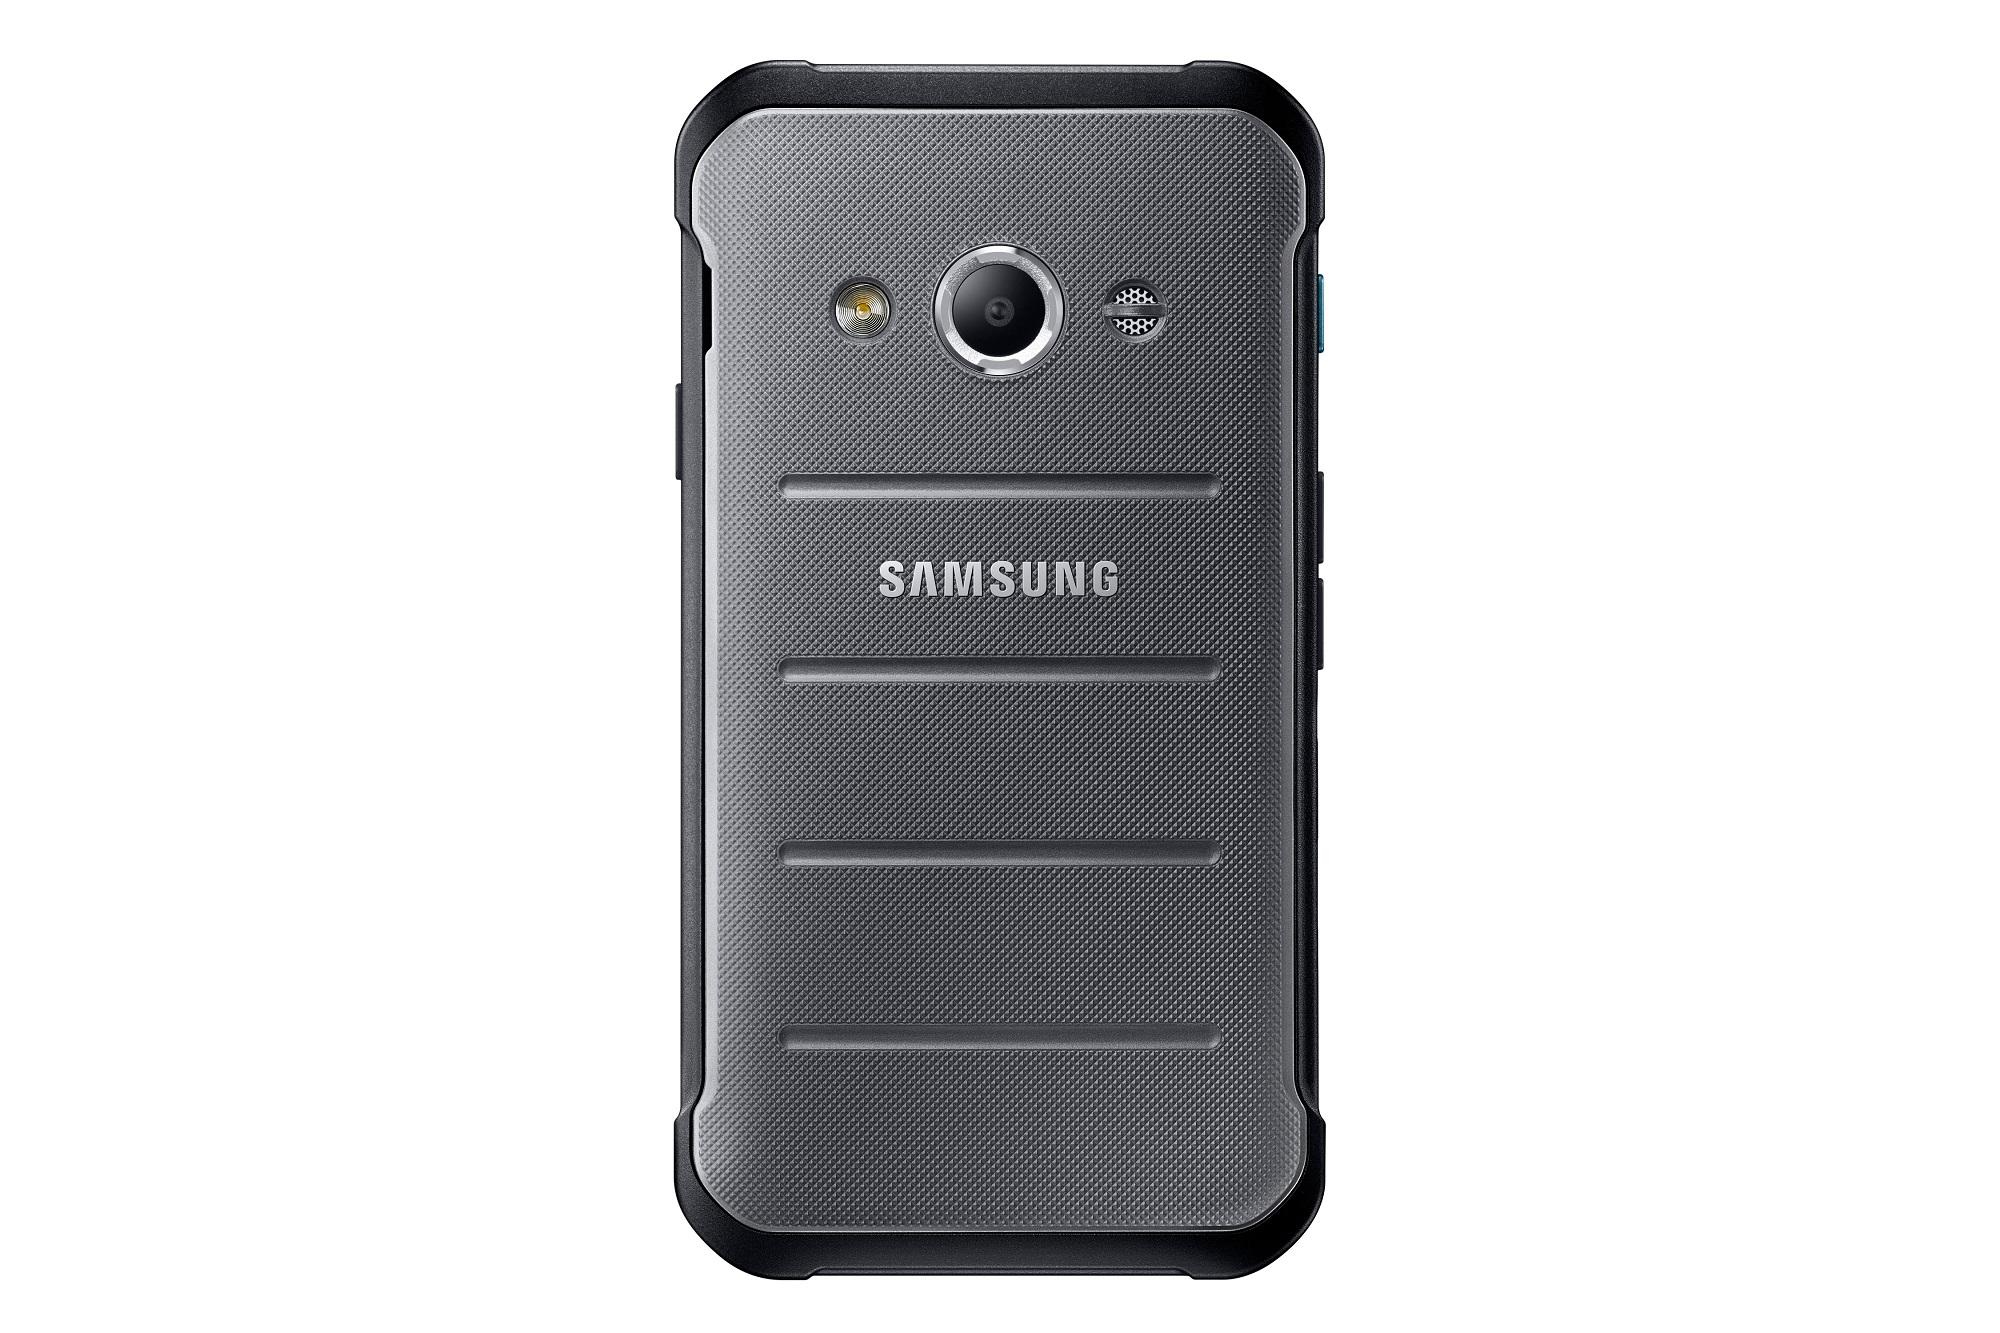 Samsung_Galaxy_Xcover 3_silver_back